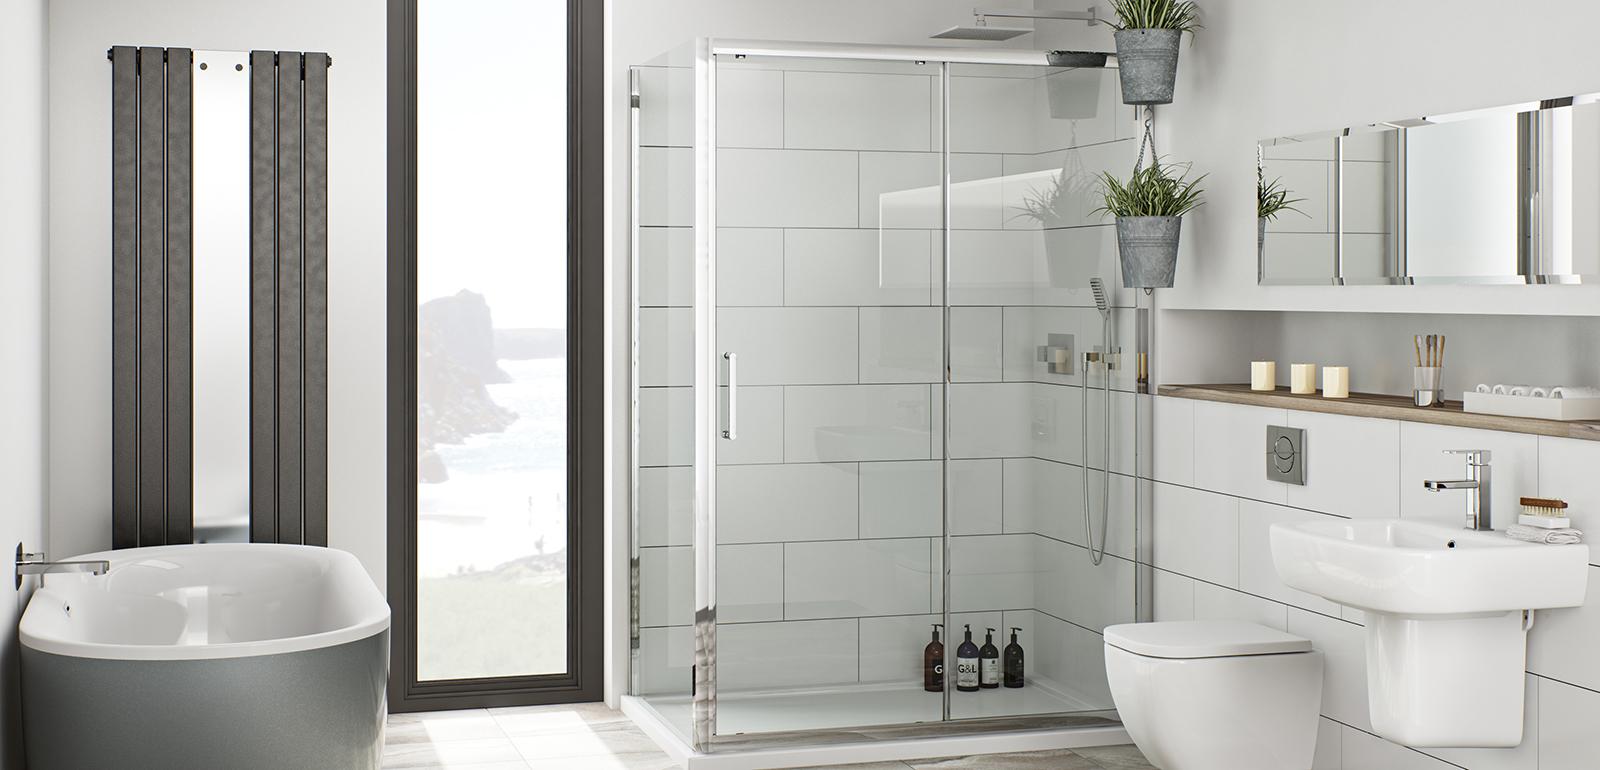 Design For Small Bathroom Pictures: معماری دستشویی و حمام رنگارنگ